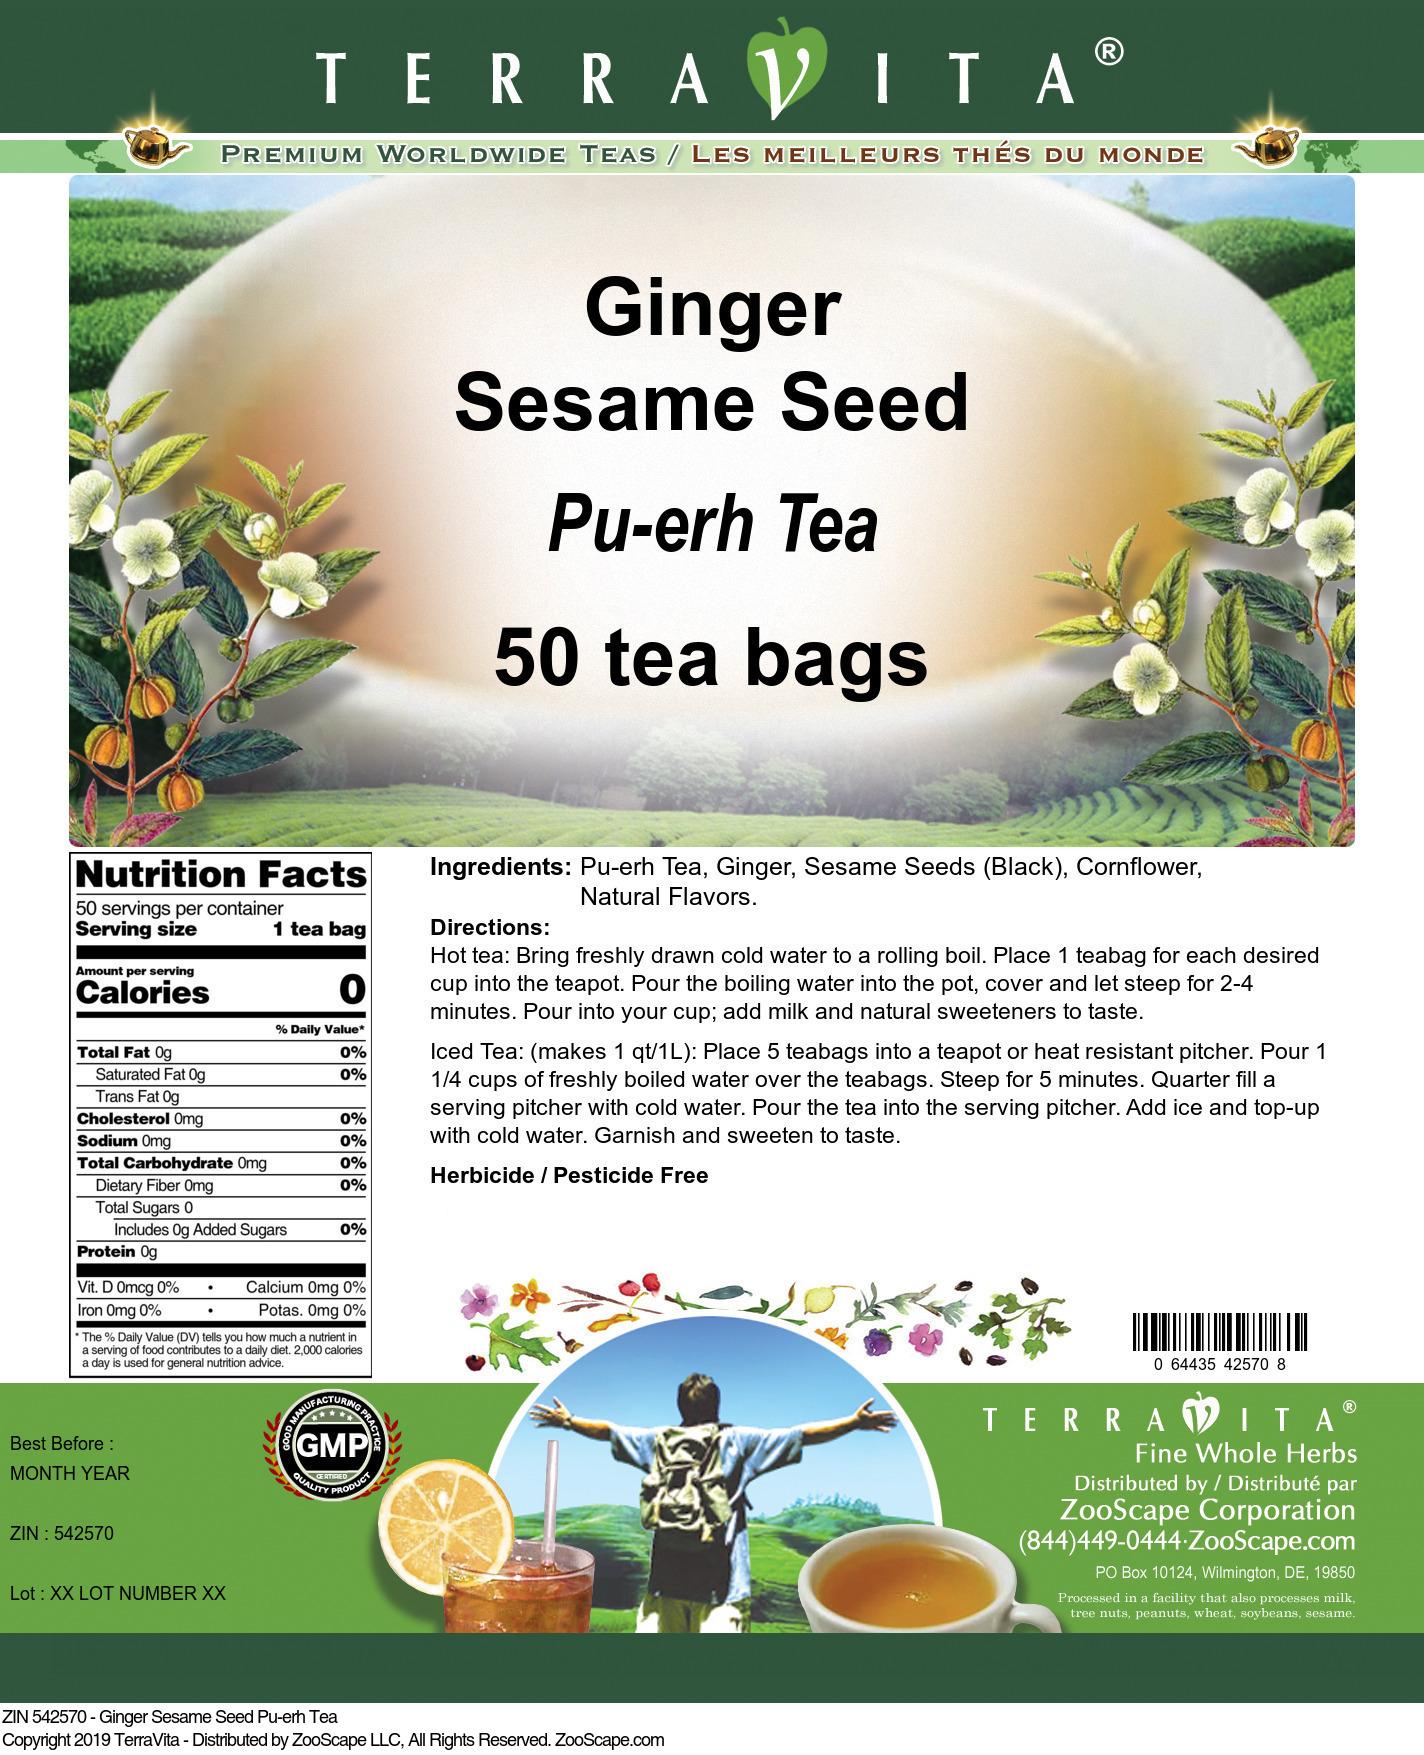 Ginger Sesame Seed Pu-erh Tea